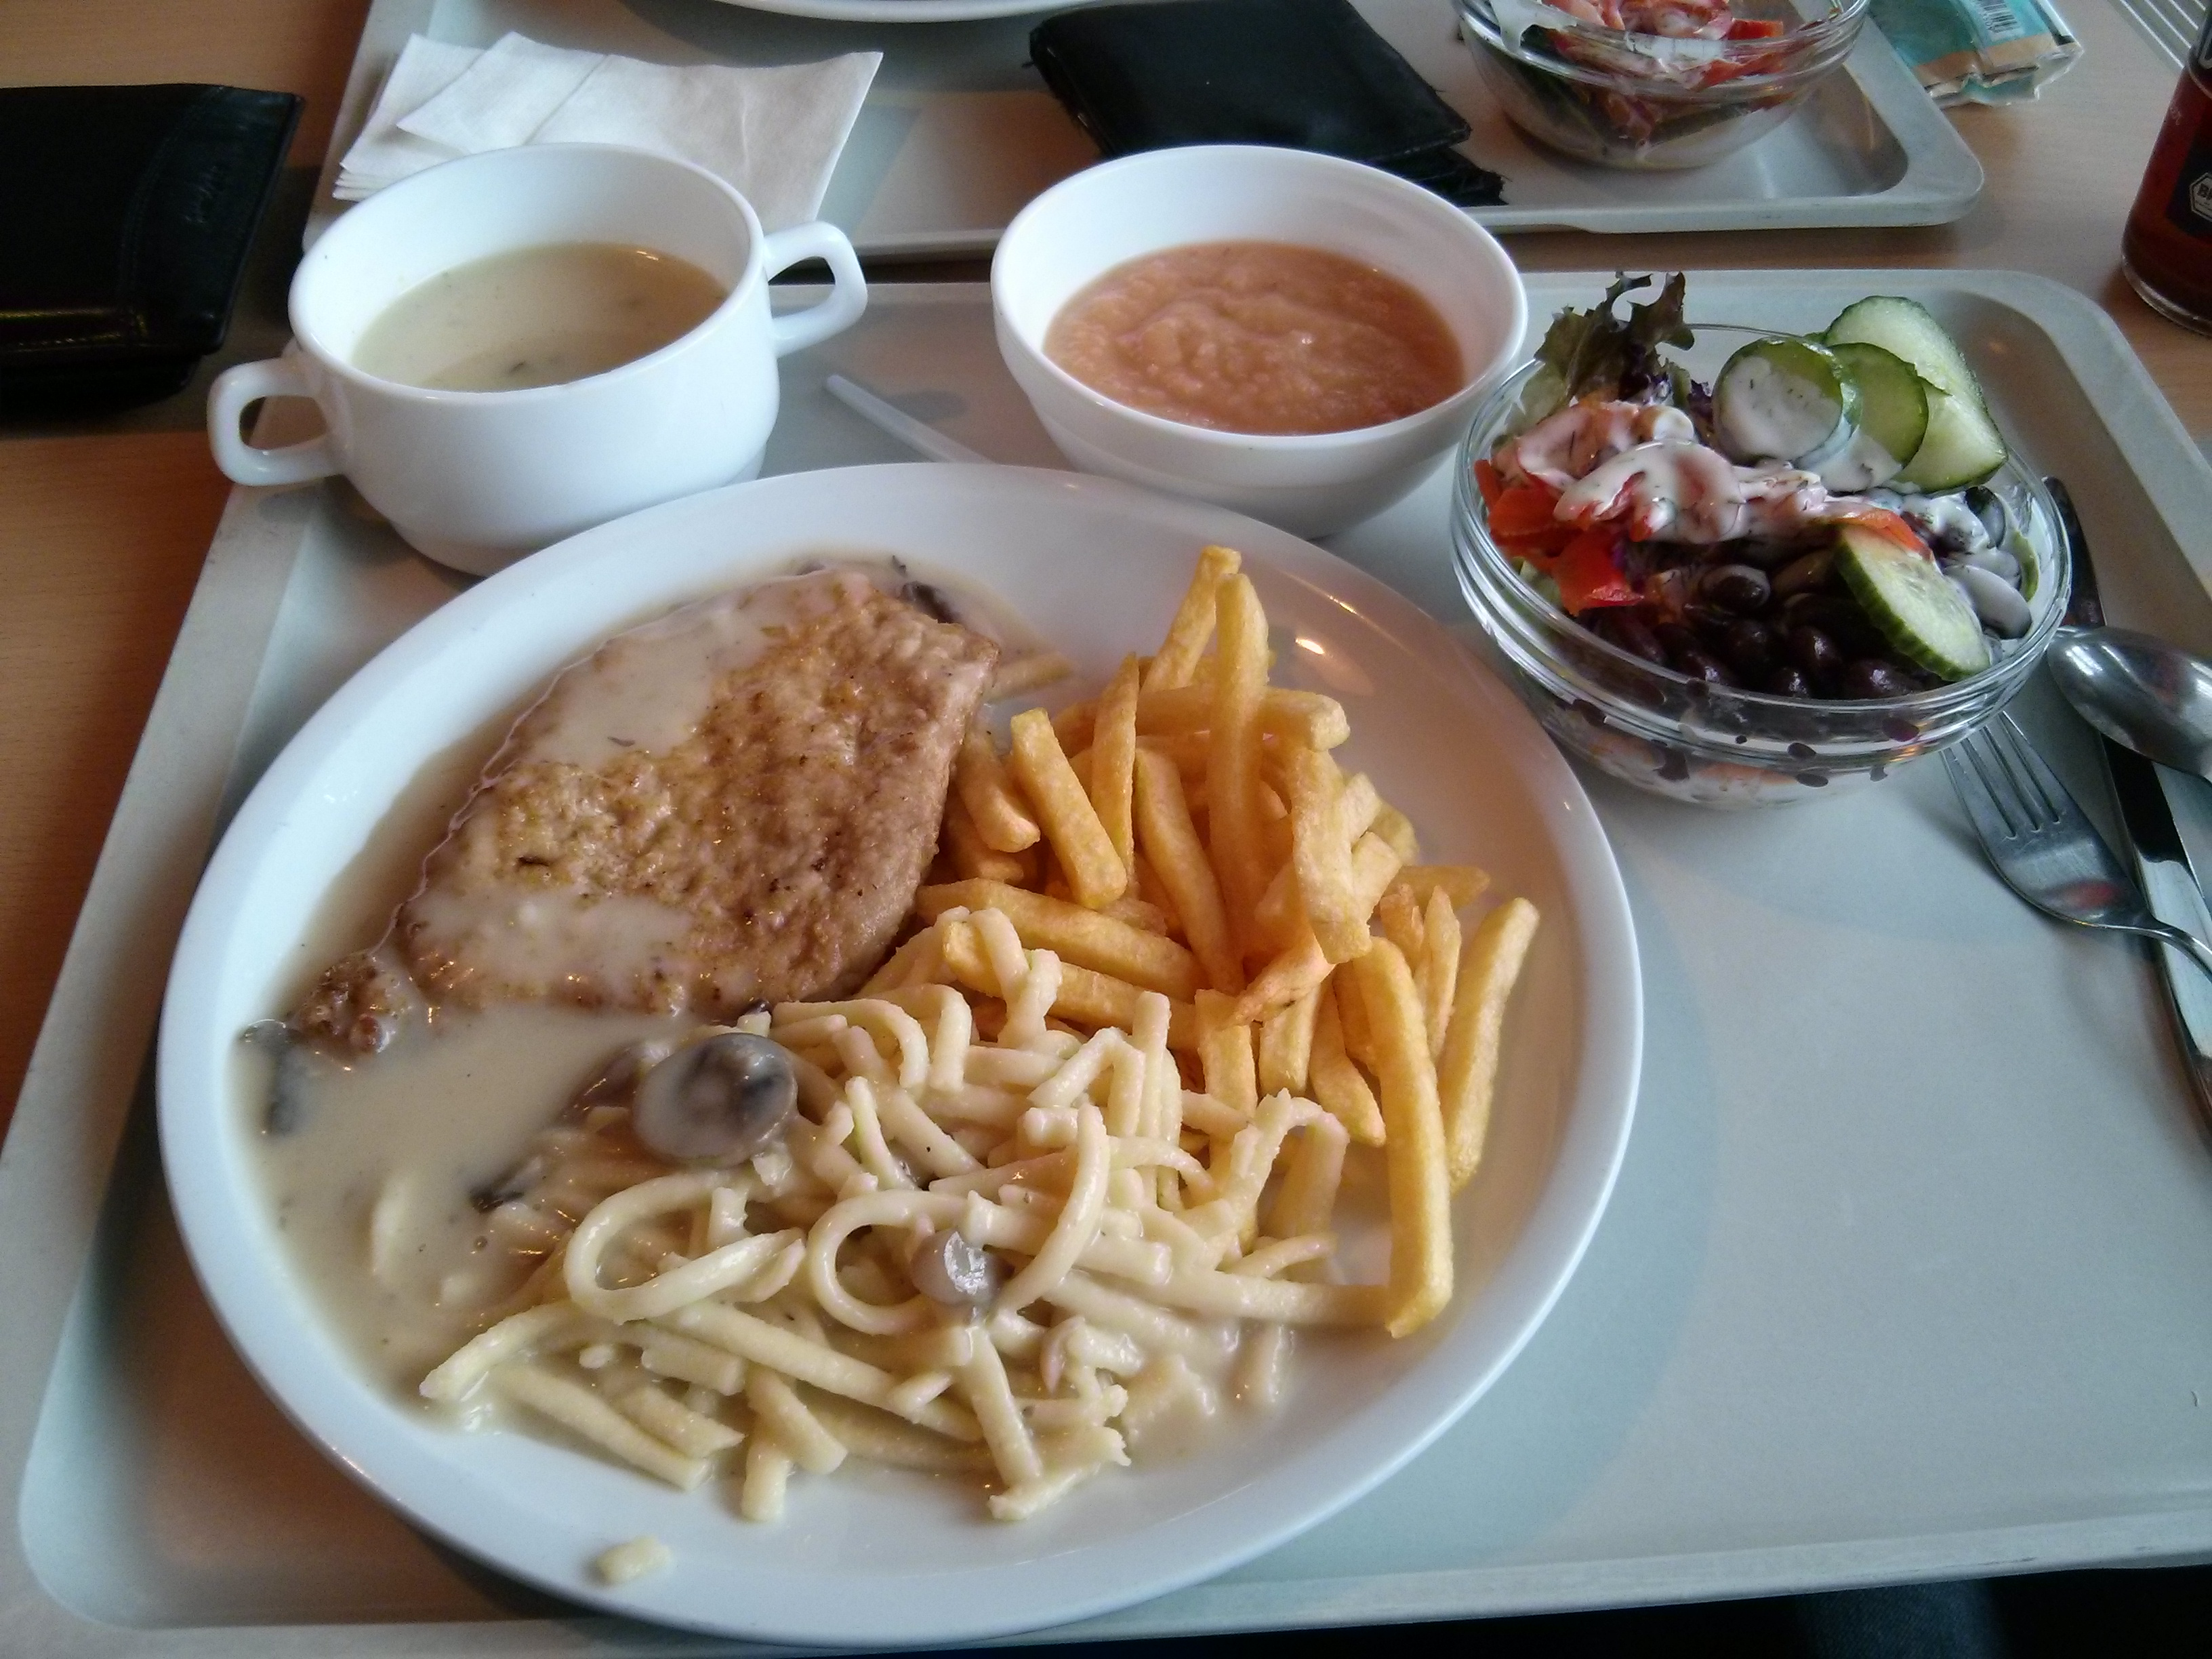 https://foodloader.net/nico_2013-09-12_pfefferrahmschnitzel-pommes-spaetzle-suppe-salat-apfelmus.jpg